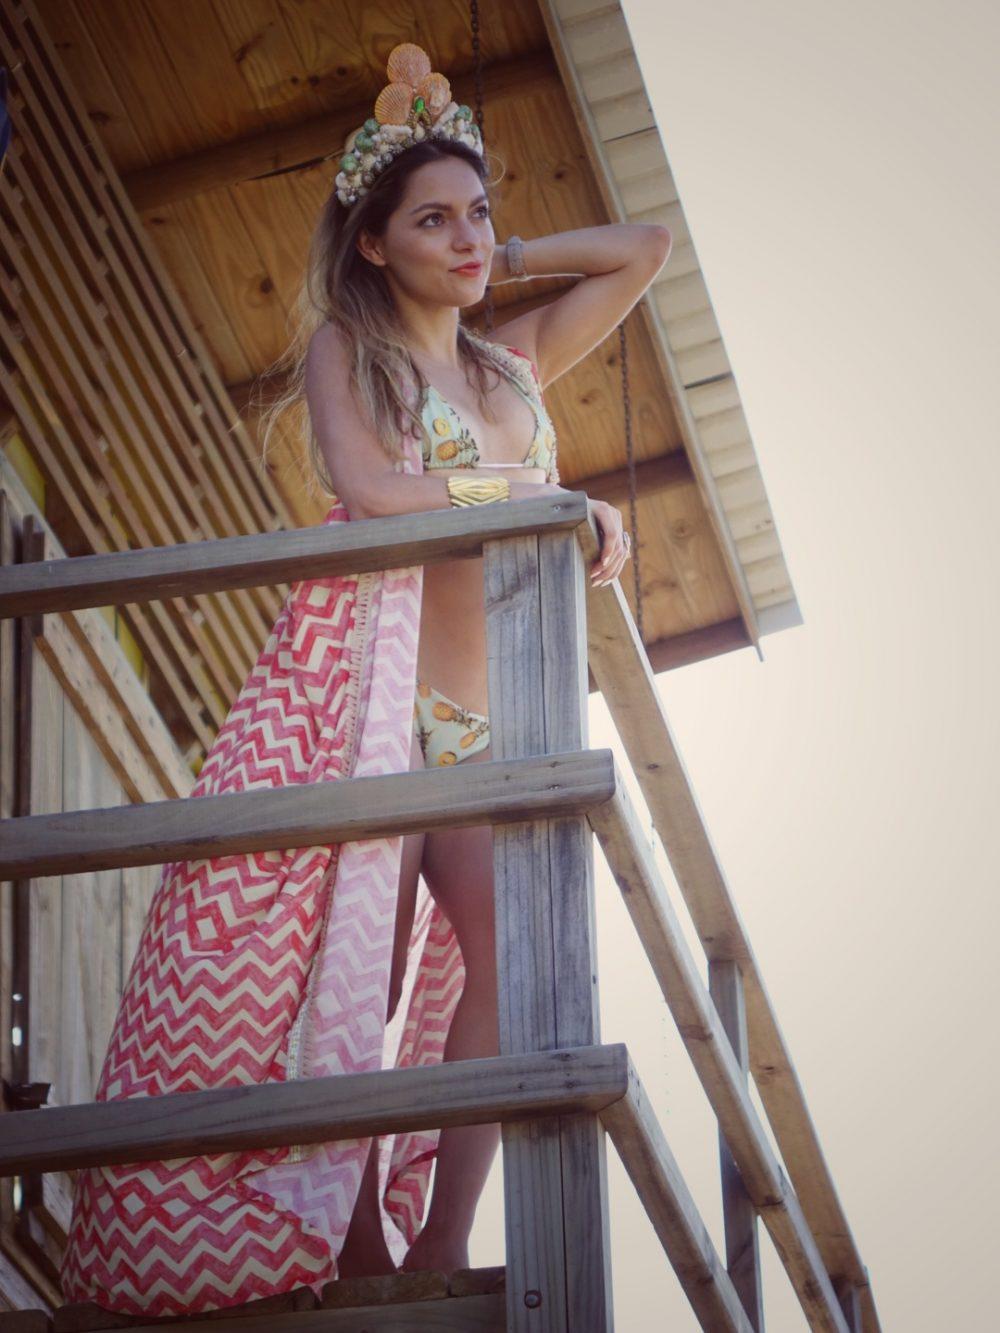 Whitney's Wonderland Costa Rican and UK Top Fashion Blogger wearing Maaji long kimono in Jaco, Costa Rica